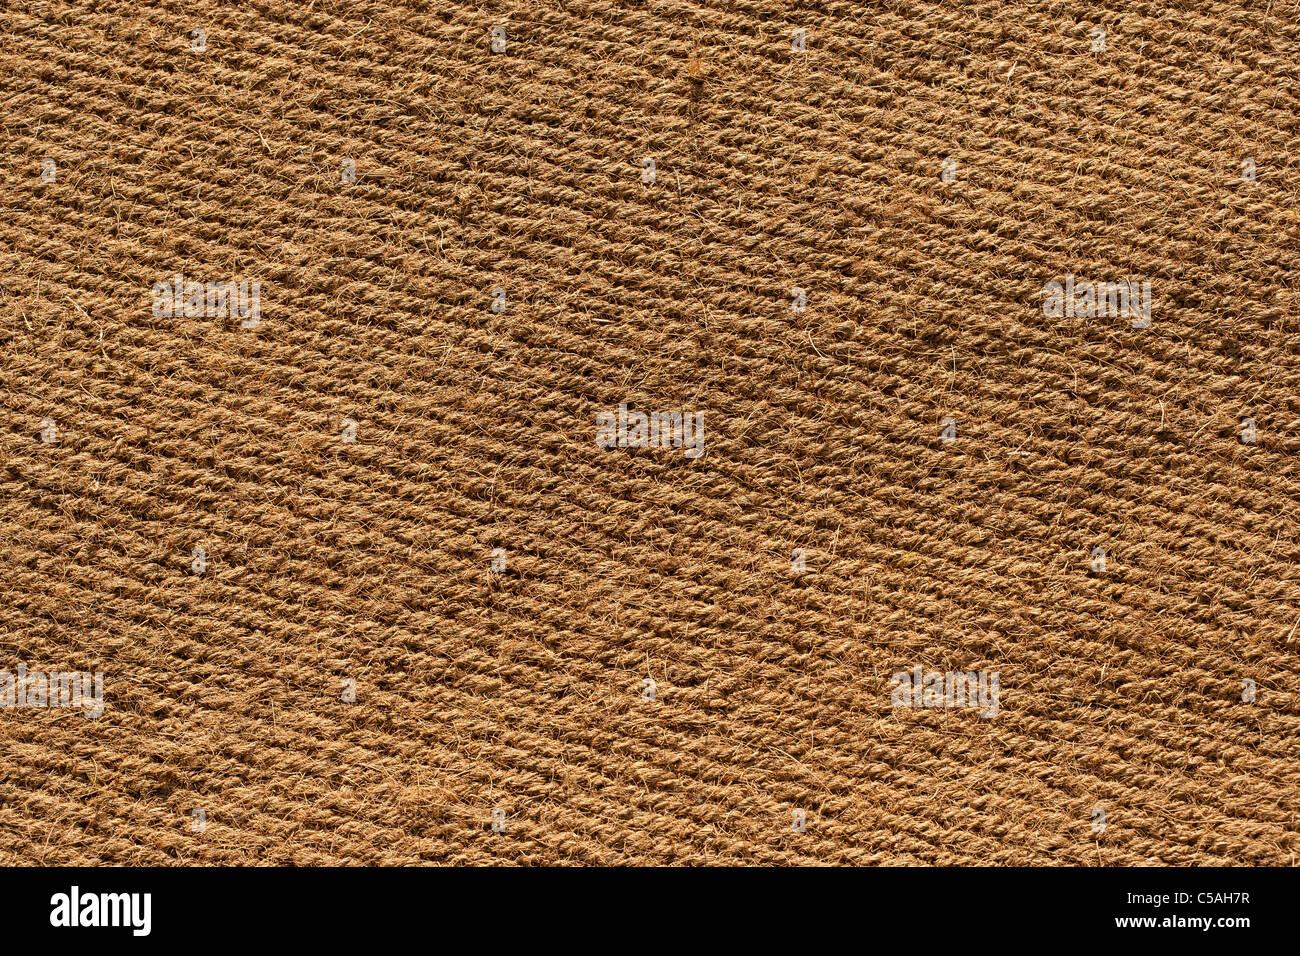 manipis pangasinan pricelist up guages pick kikshardware philippine area mating matting x size philippines mat product steel